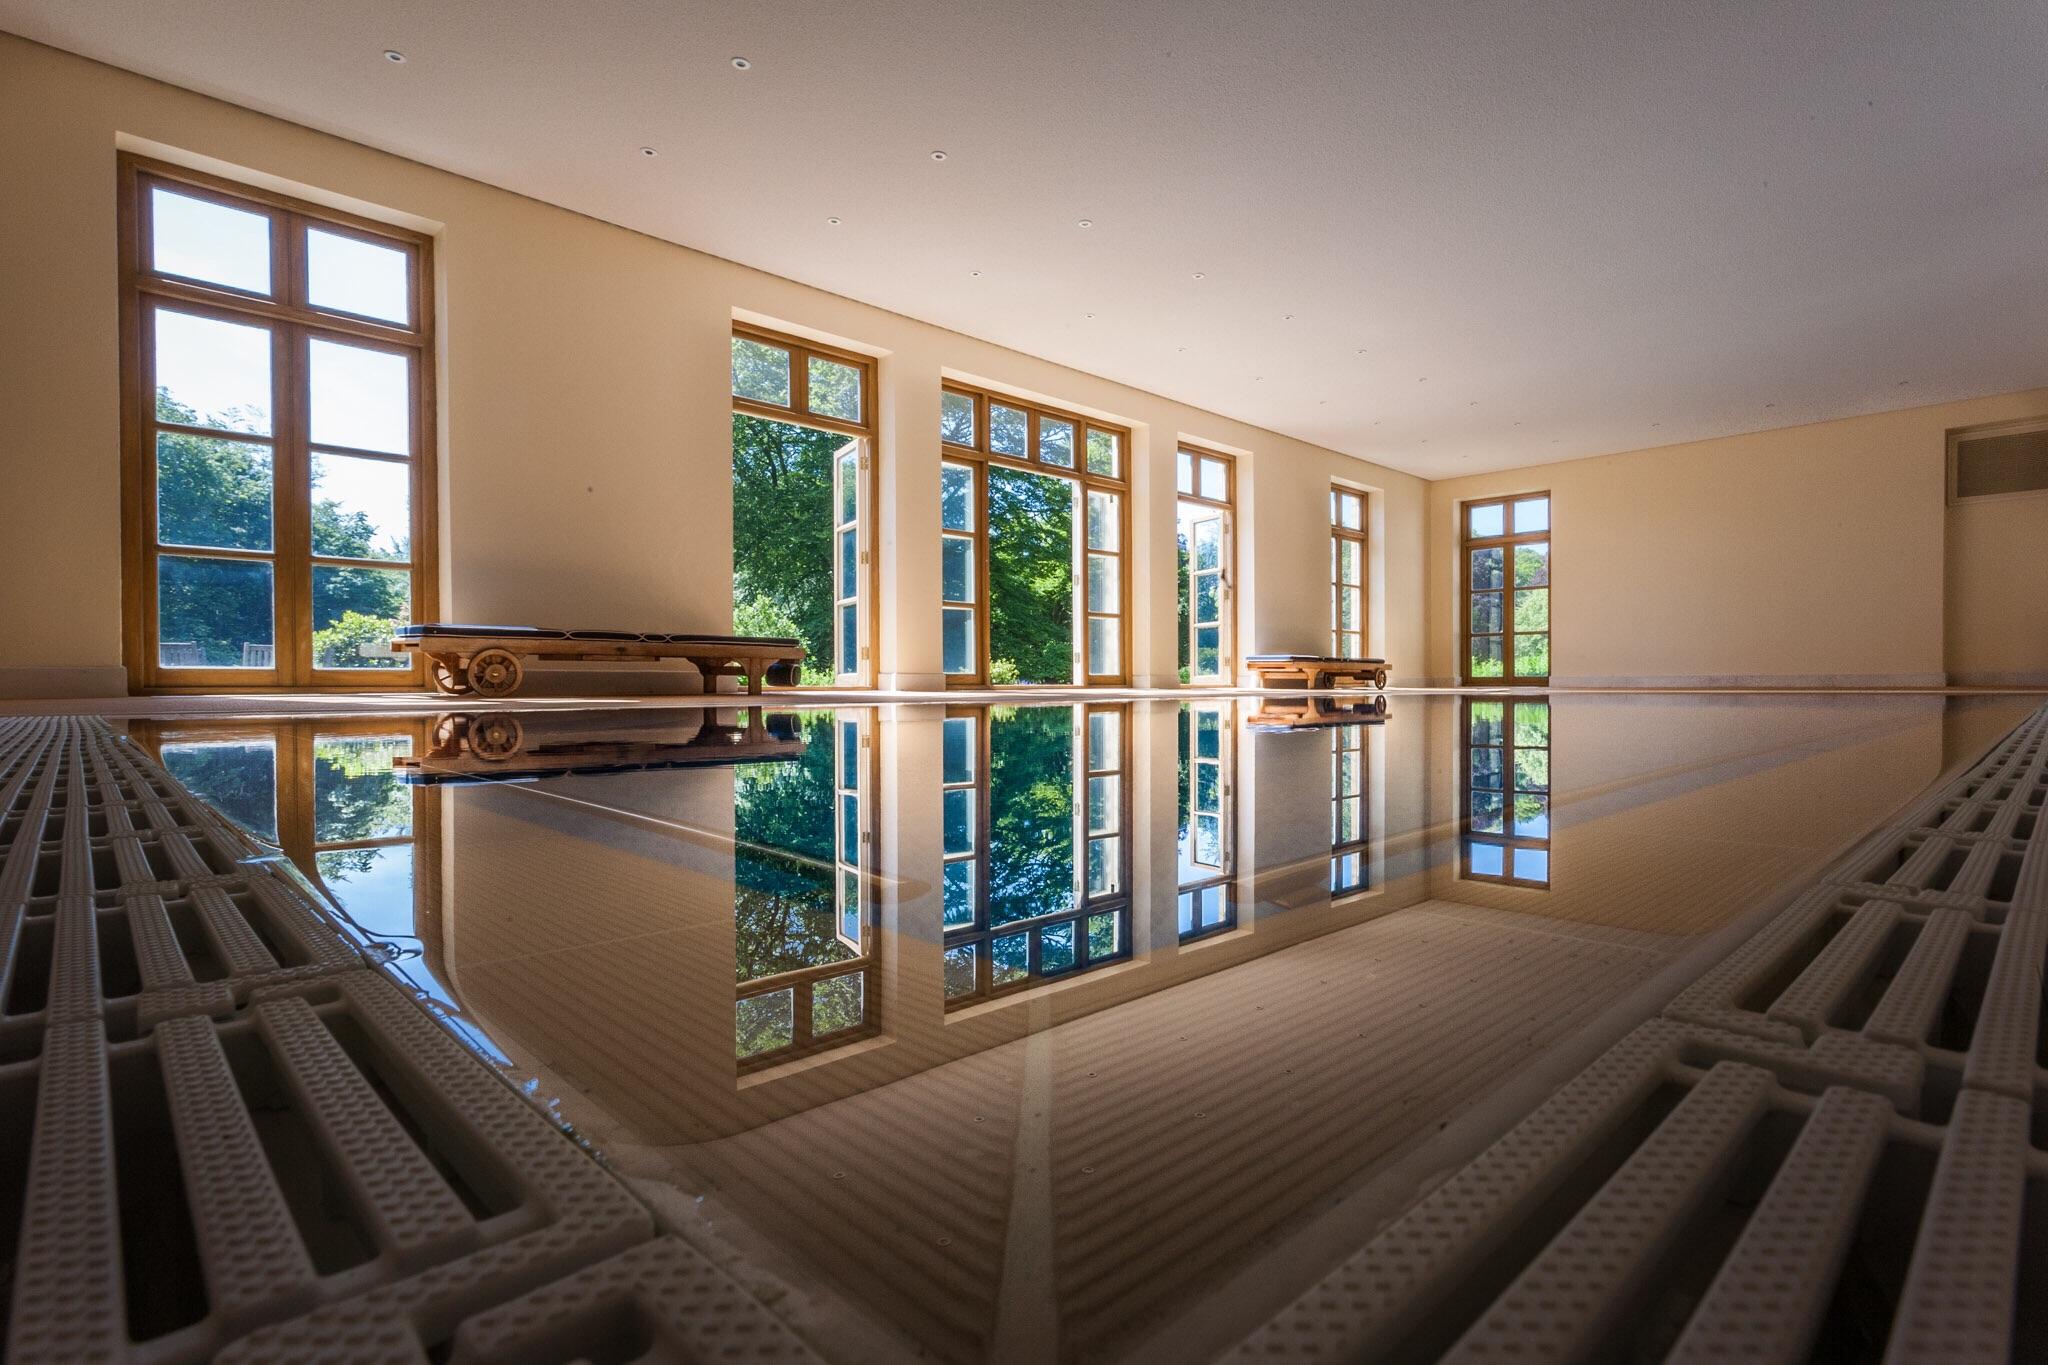 Swimming pool, Dorset, by Rick McEvoy Interior Photographer